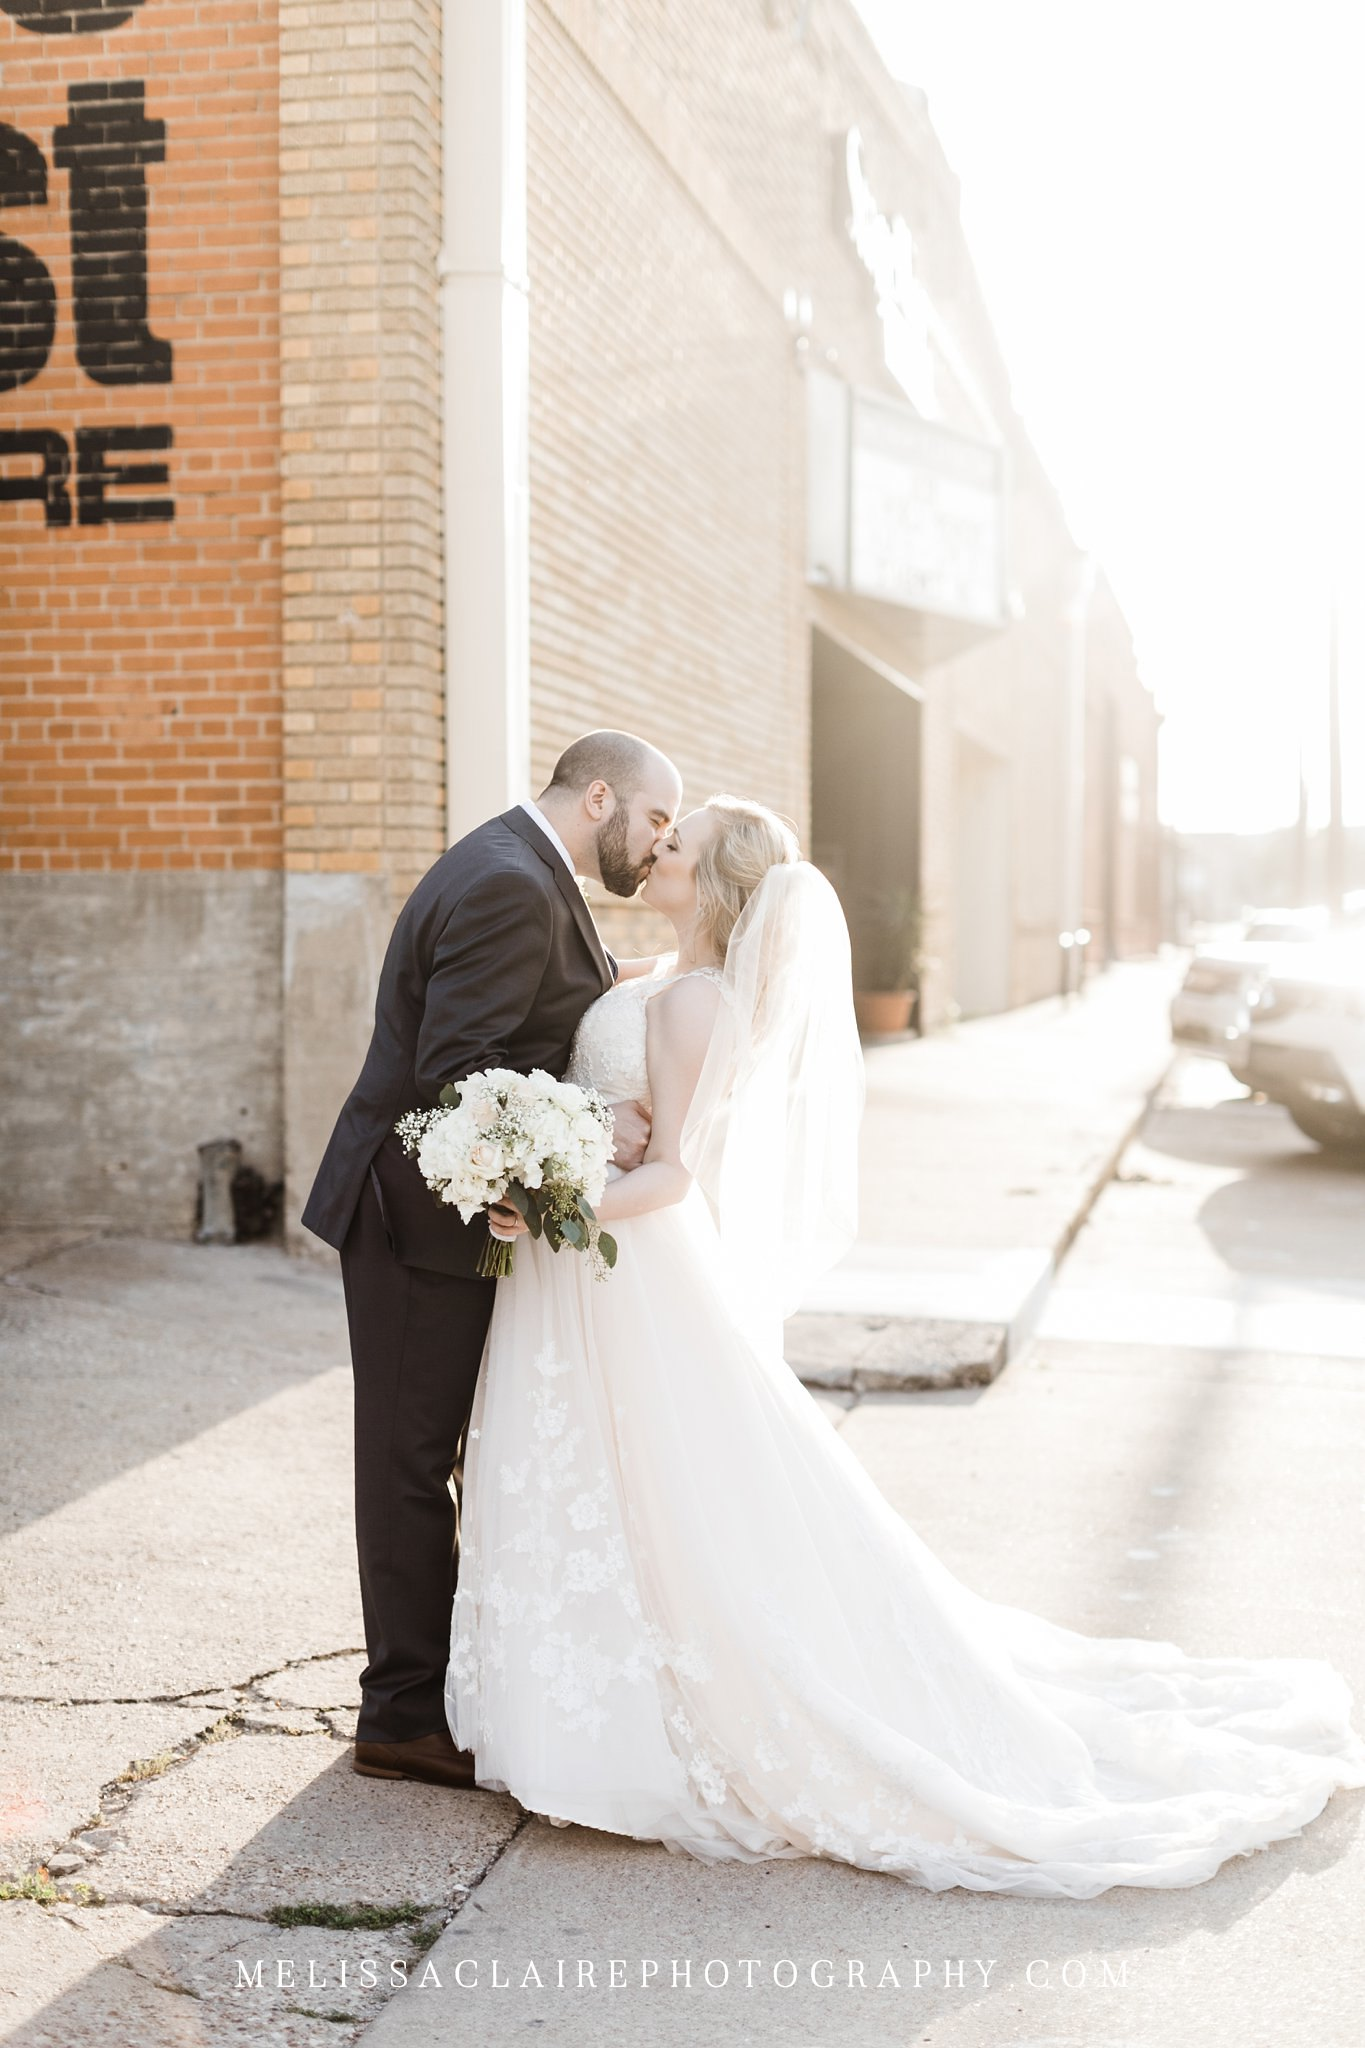 809_at_vickery_wedding_0032